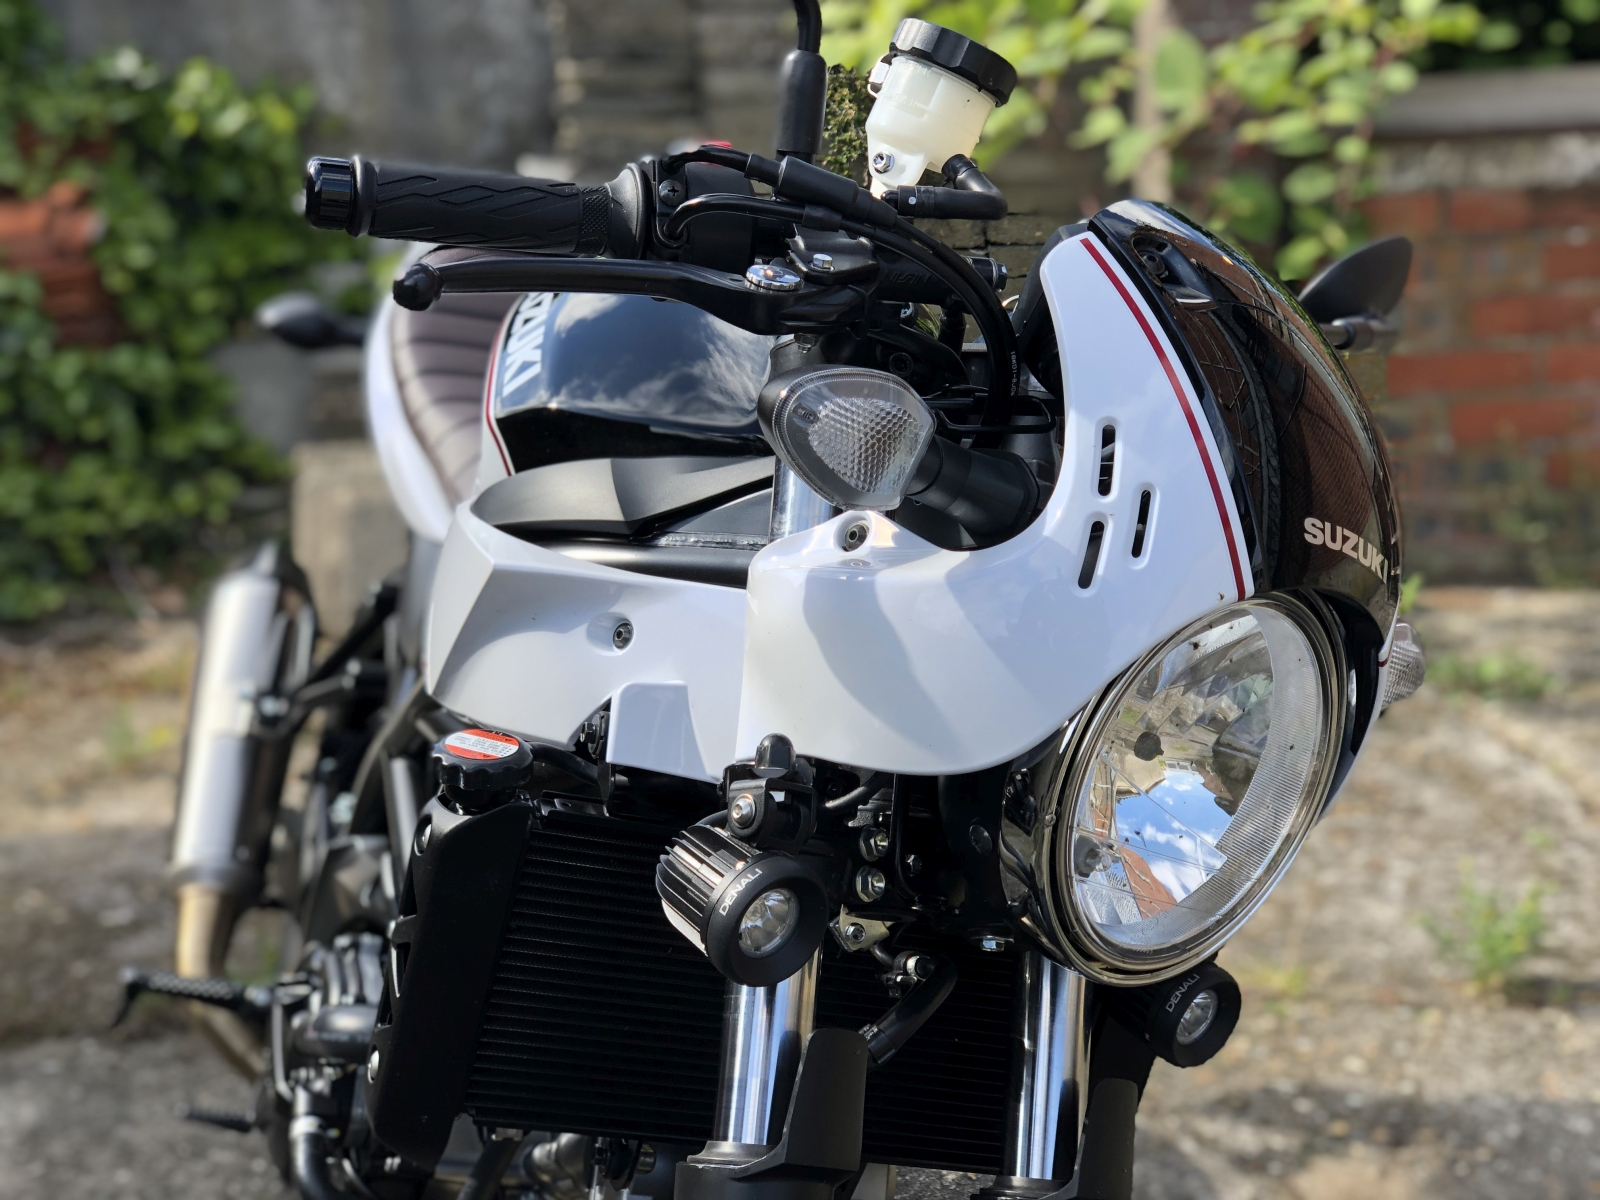 Suzuki SV650X Café Pack 2019 - MotorRAI.nl